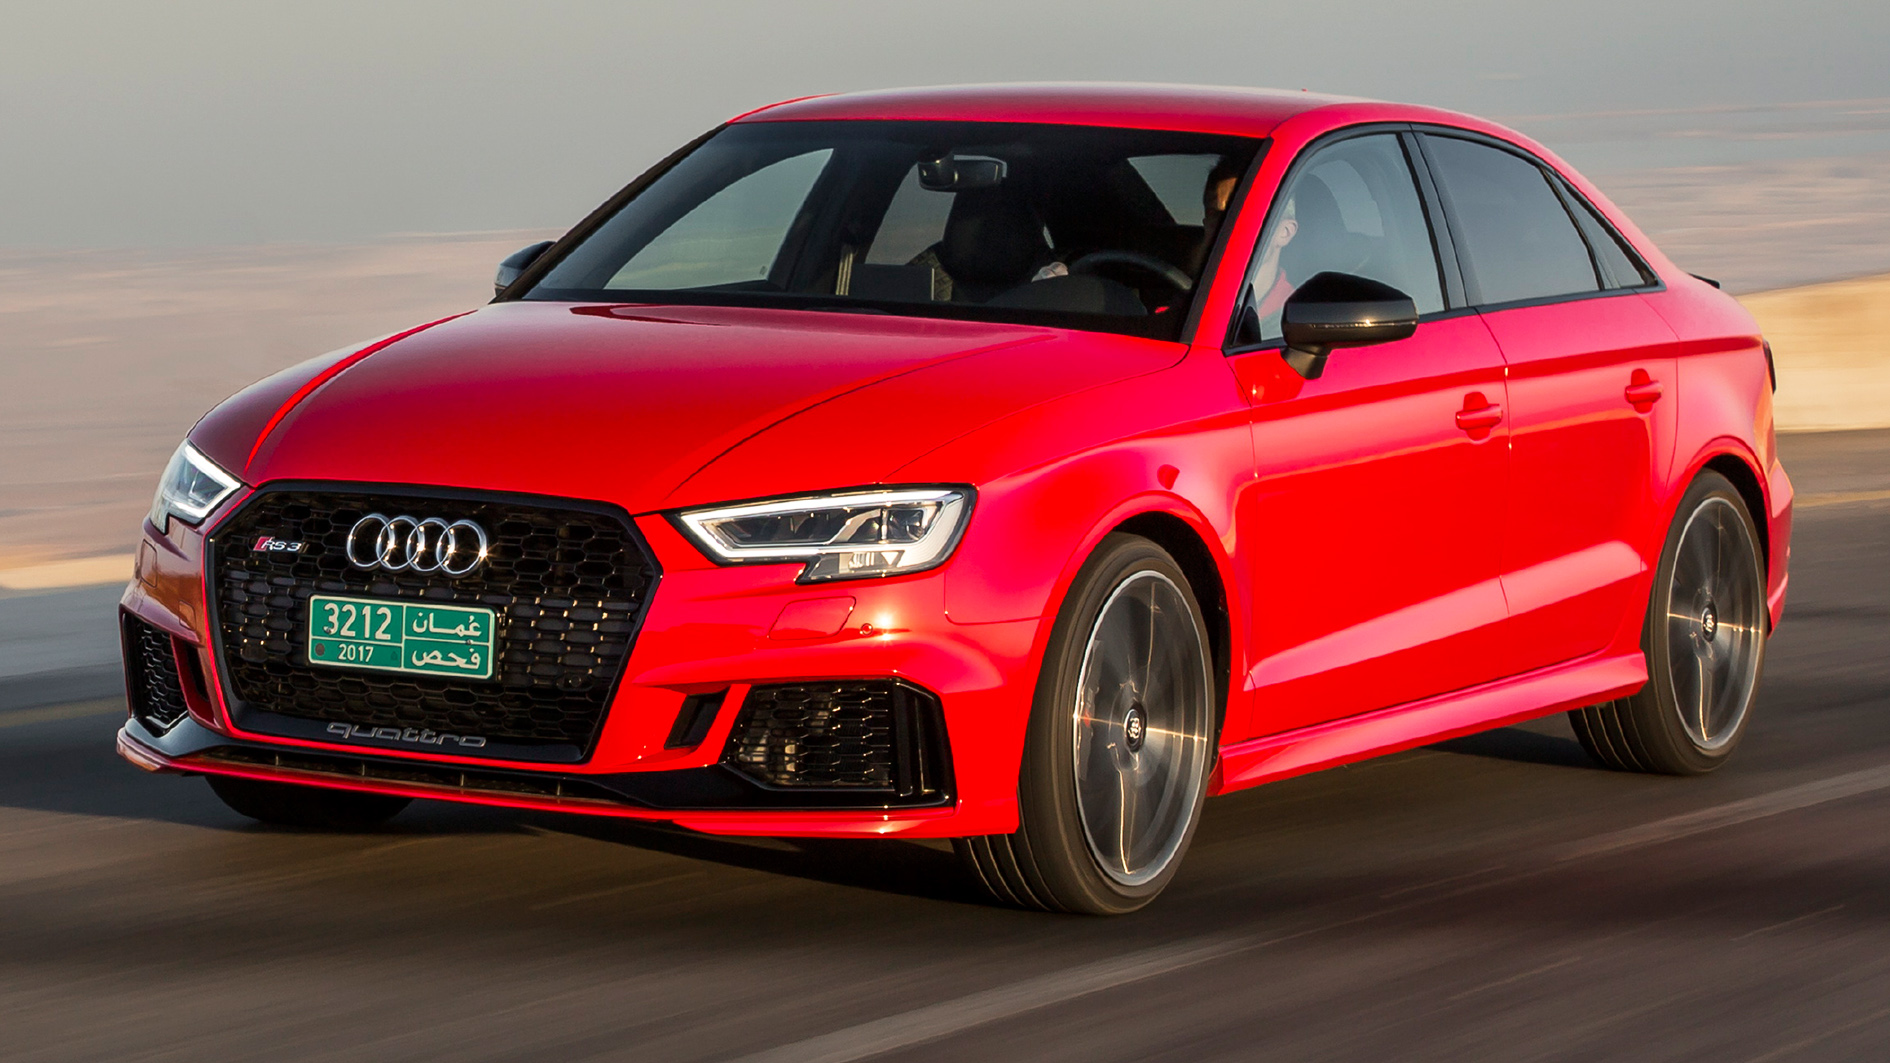 Elegant Audi RS3 2017 Sedan Test Drive Amp Review In The Oman Image Http